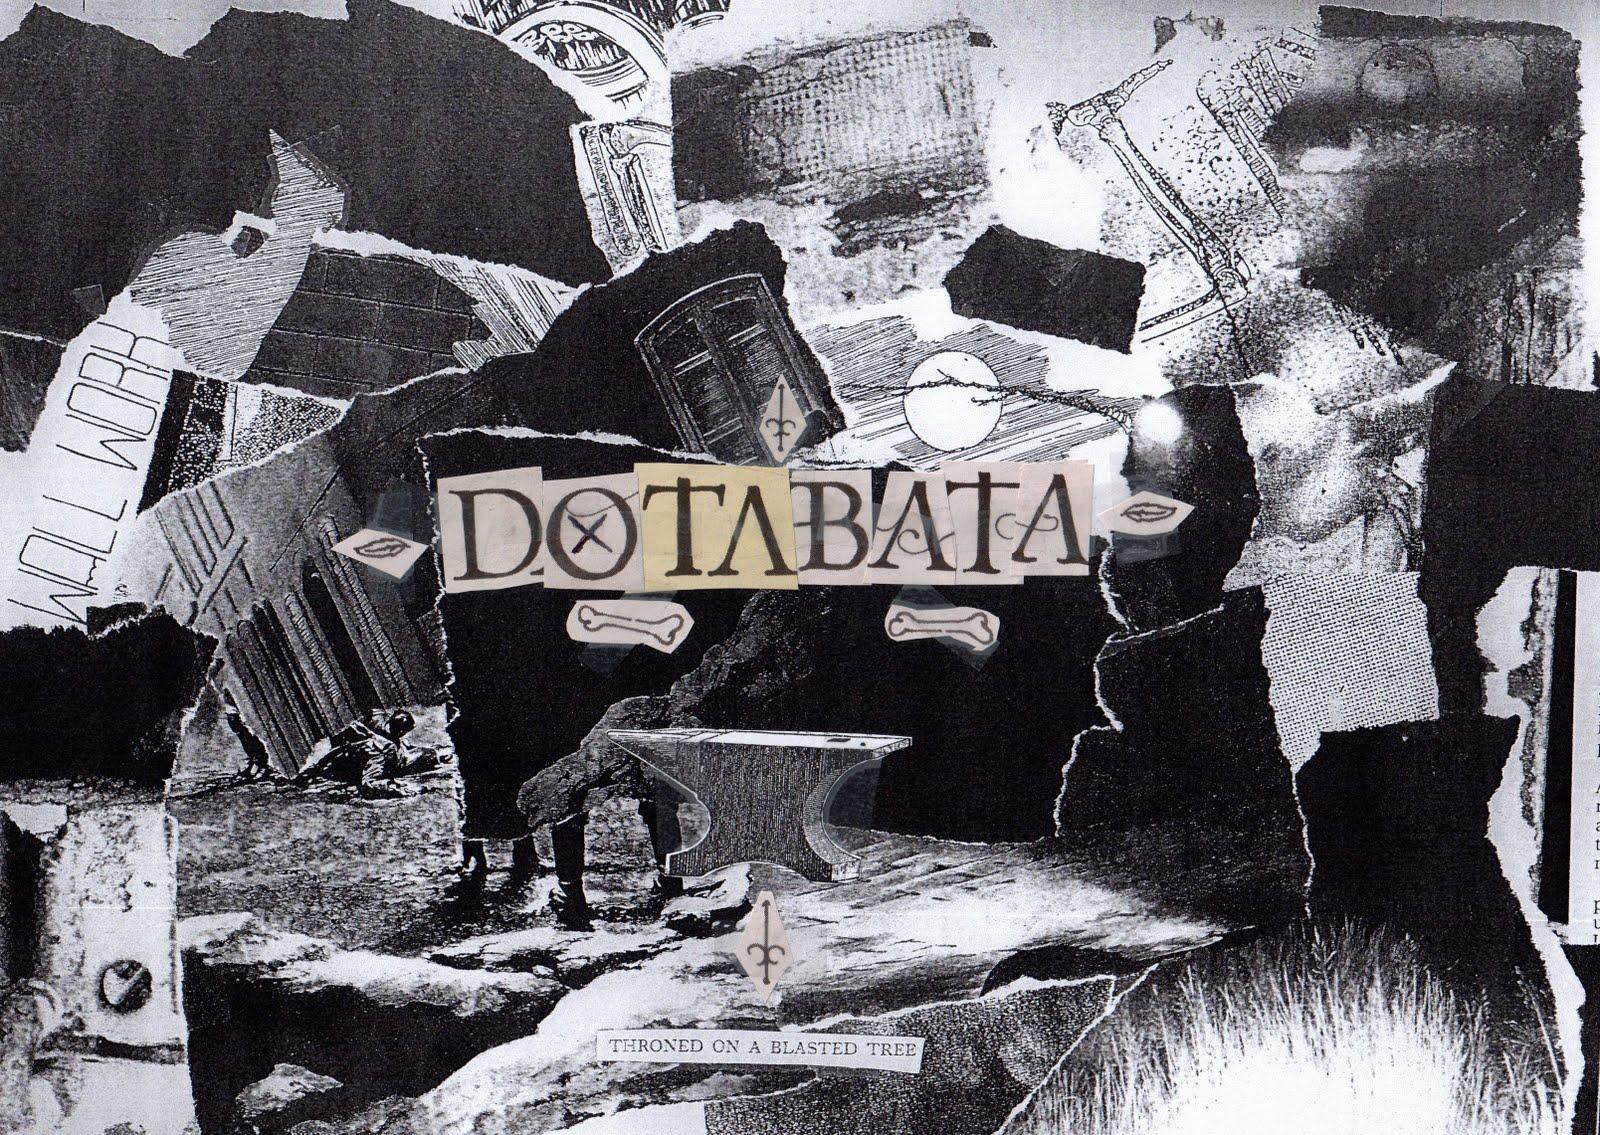 Dotabata